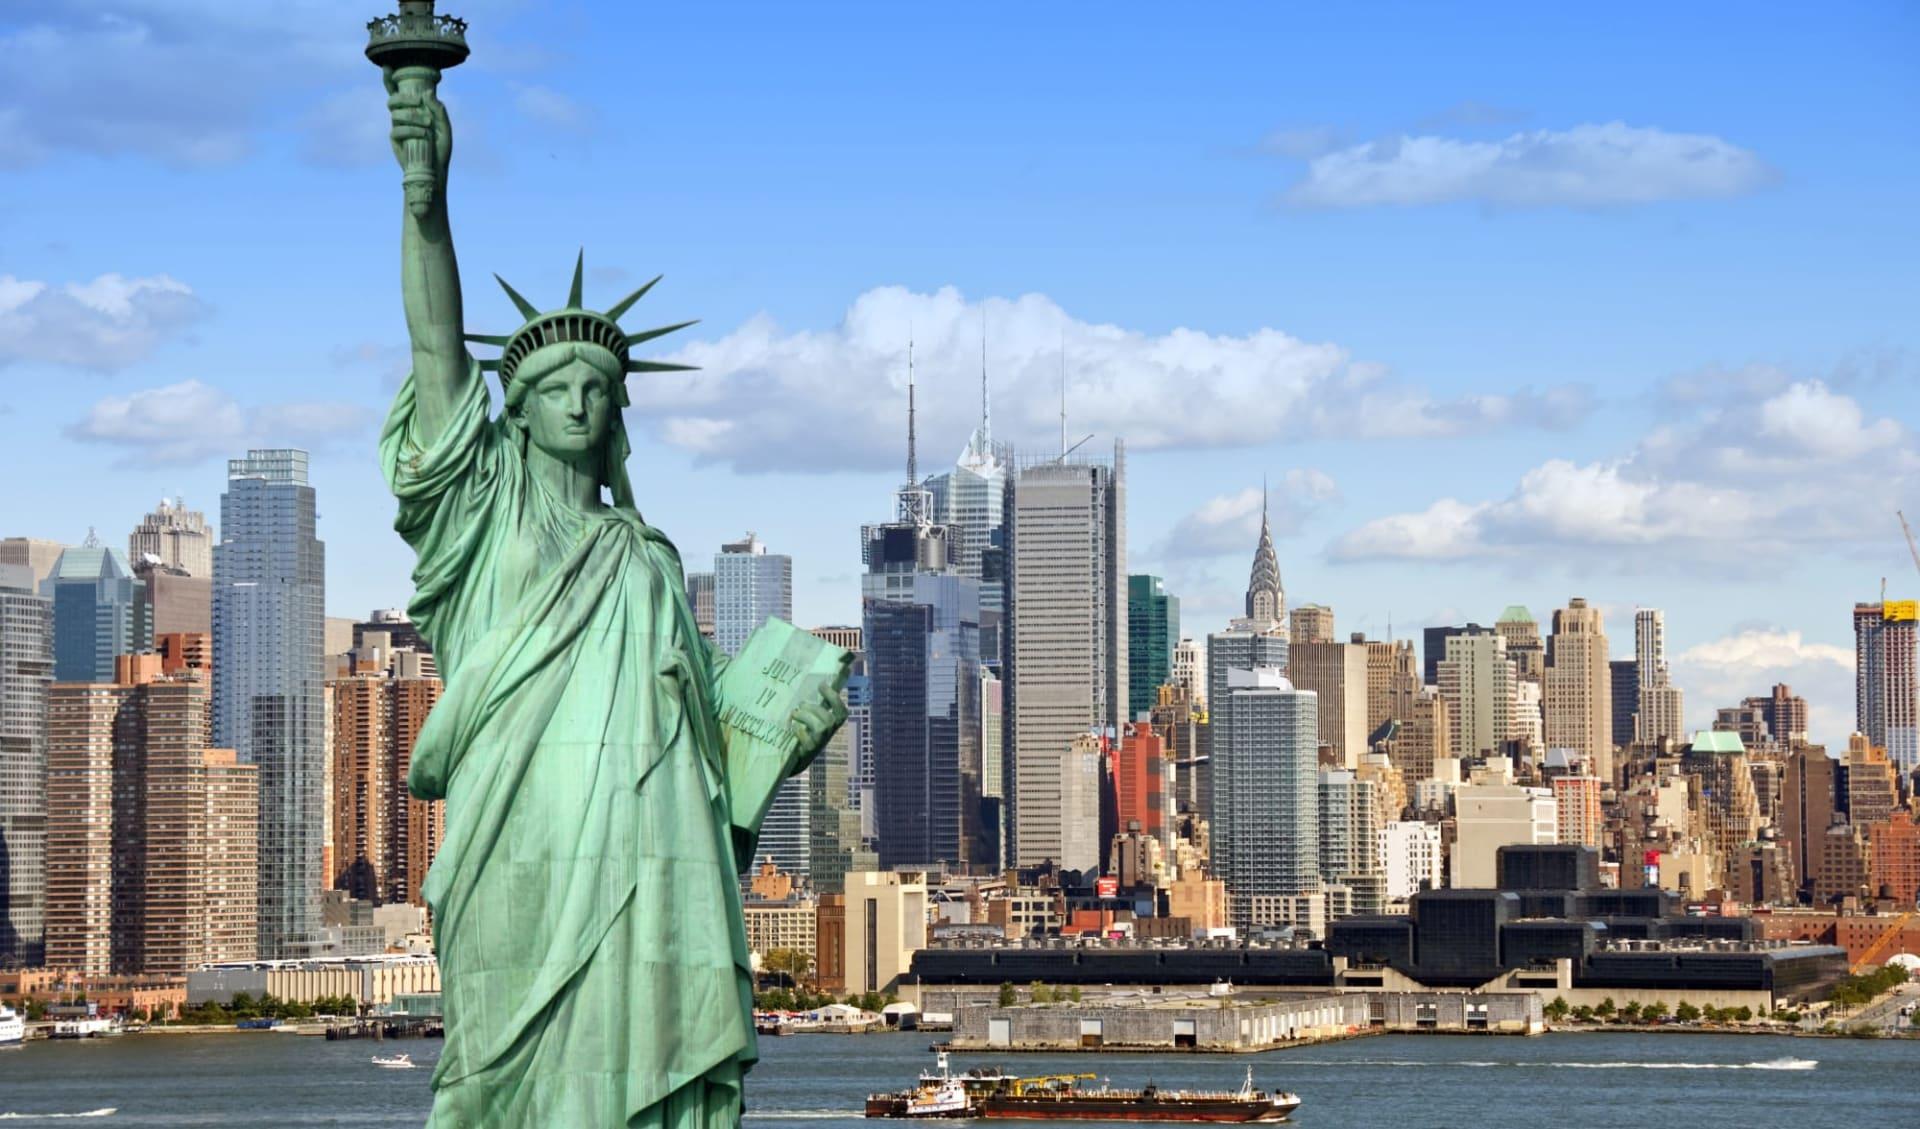 East Coast Insider ab New York City: USA - New York - Freiheitsstatue